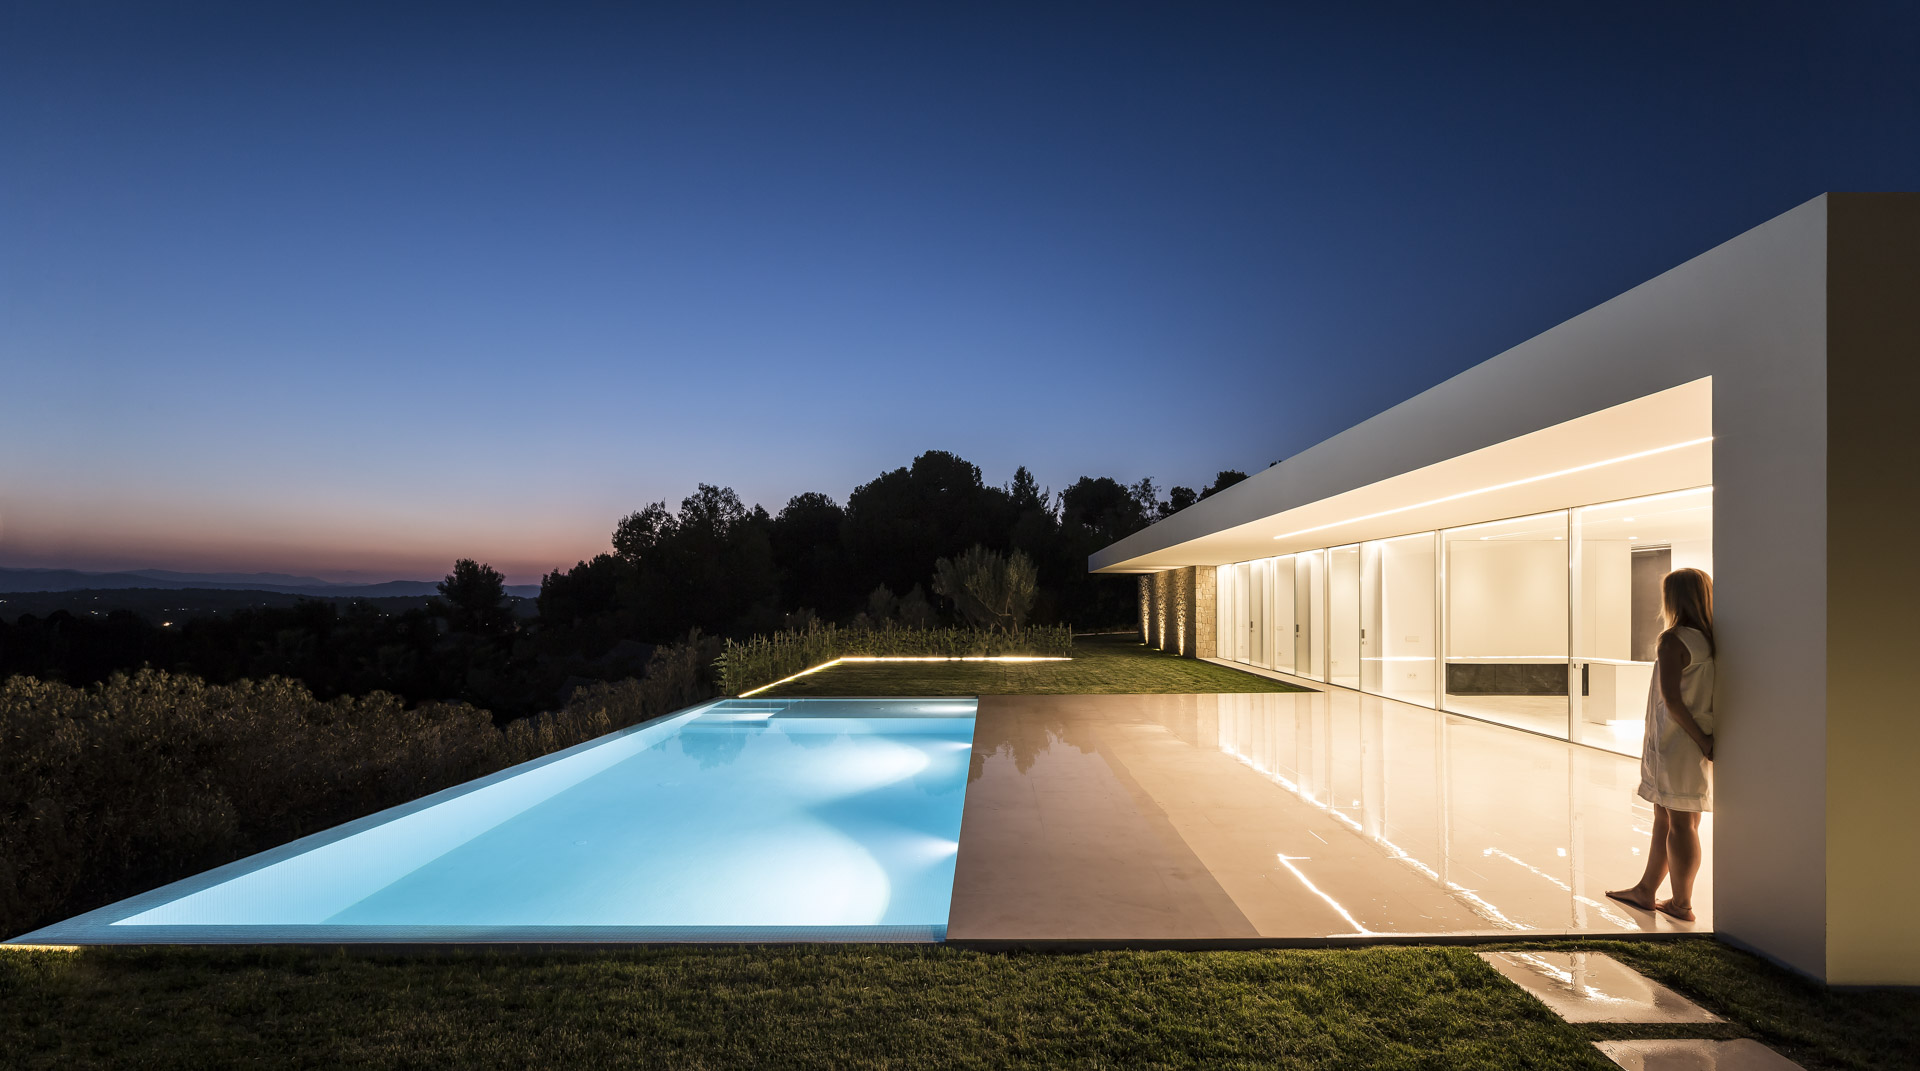 fotografia-arquitectura-valencia-german-cabo-gallardo-llopis-villamarchante-vivienda-66